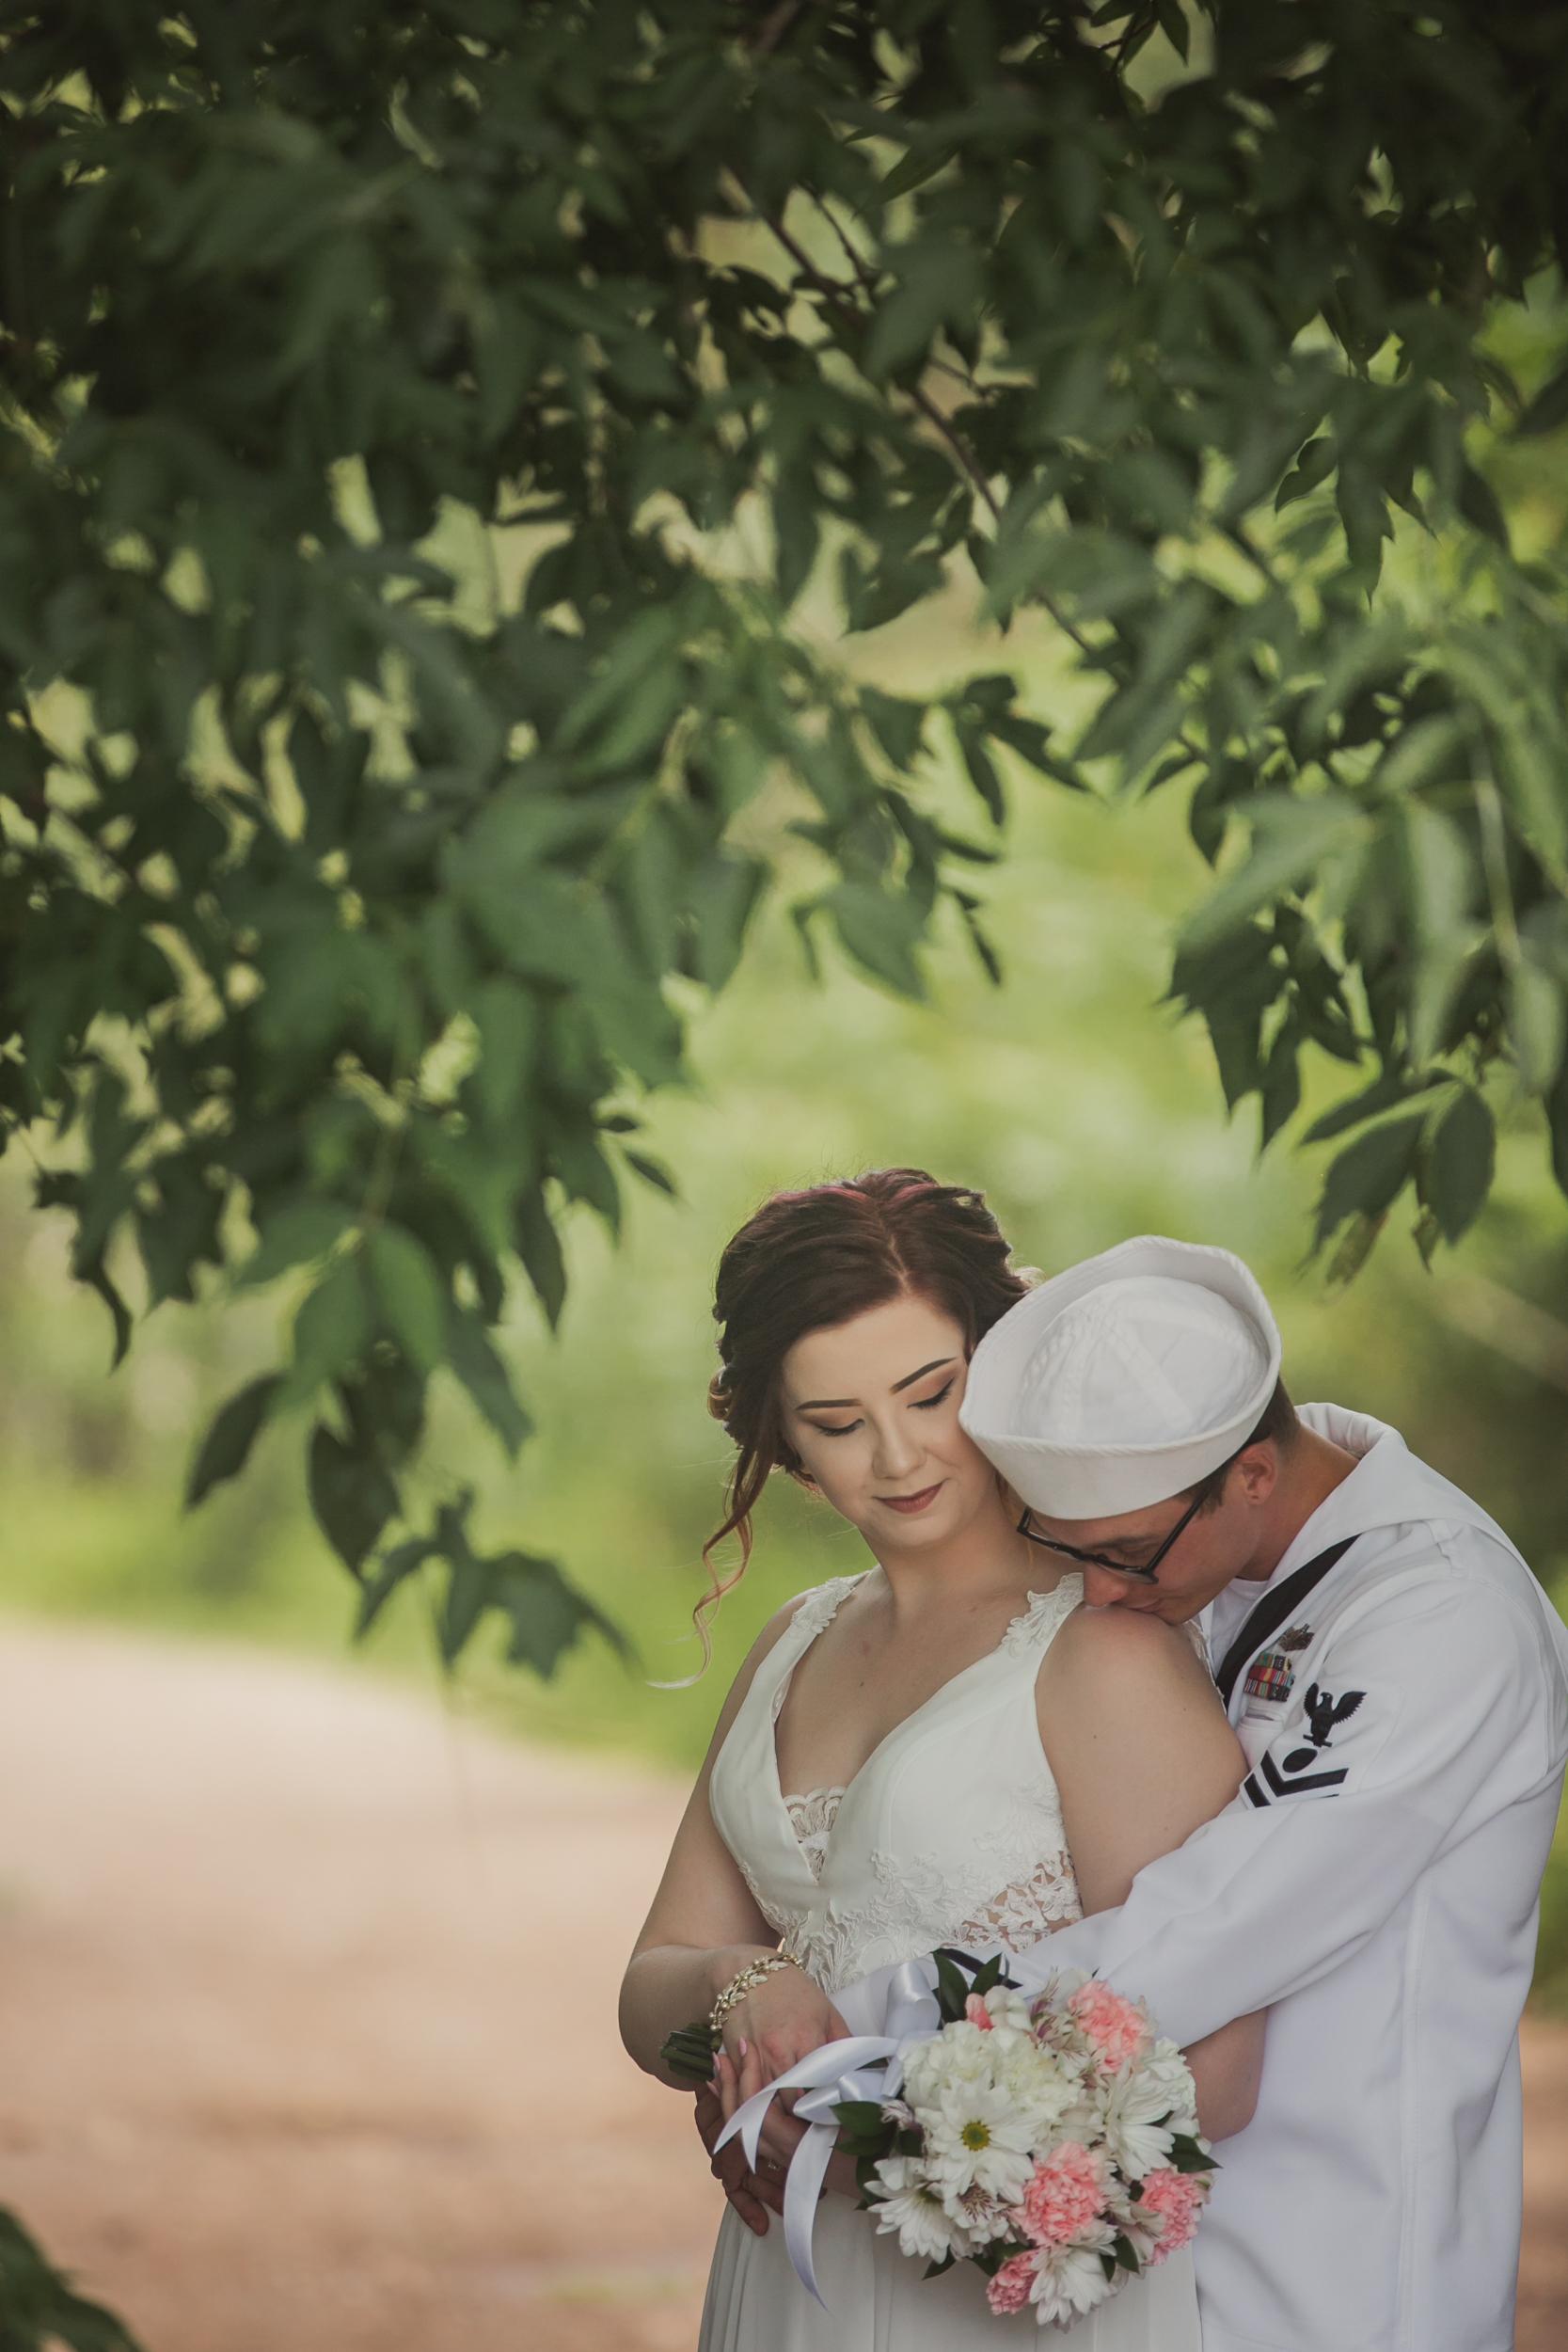 intimate elopement wedding, duluth mn, duluth mn elopement wedding, -www.rachelsmak.com16.jpg